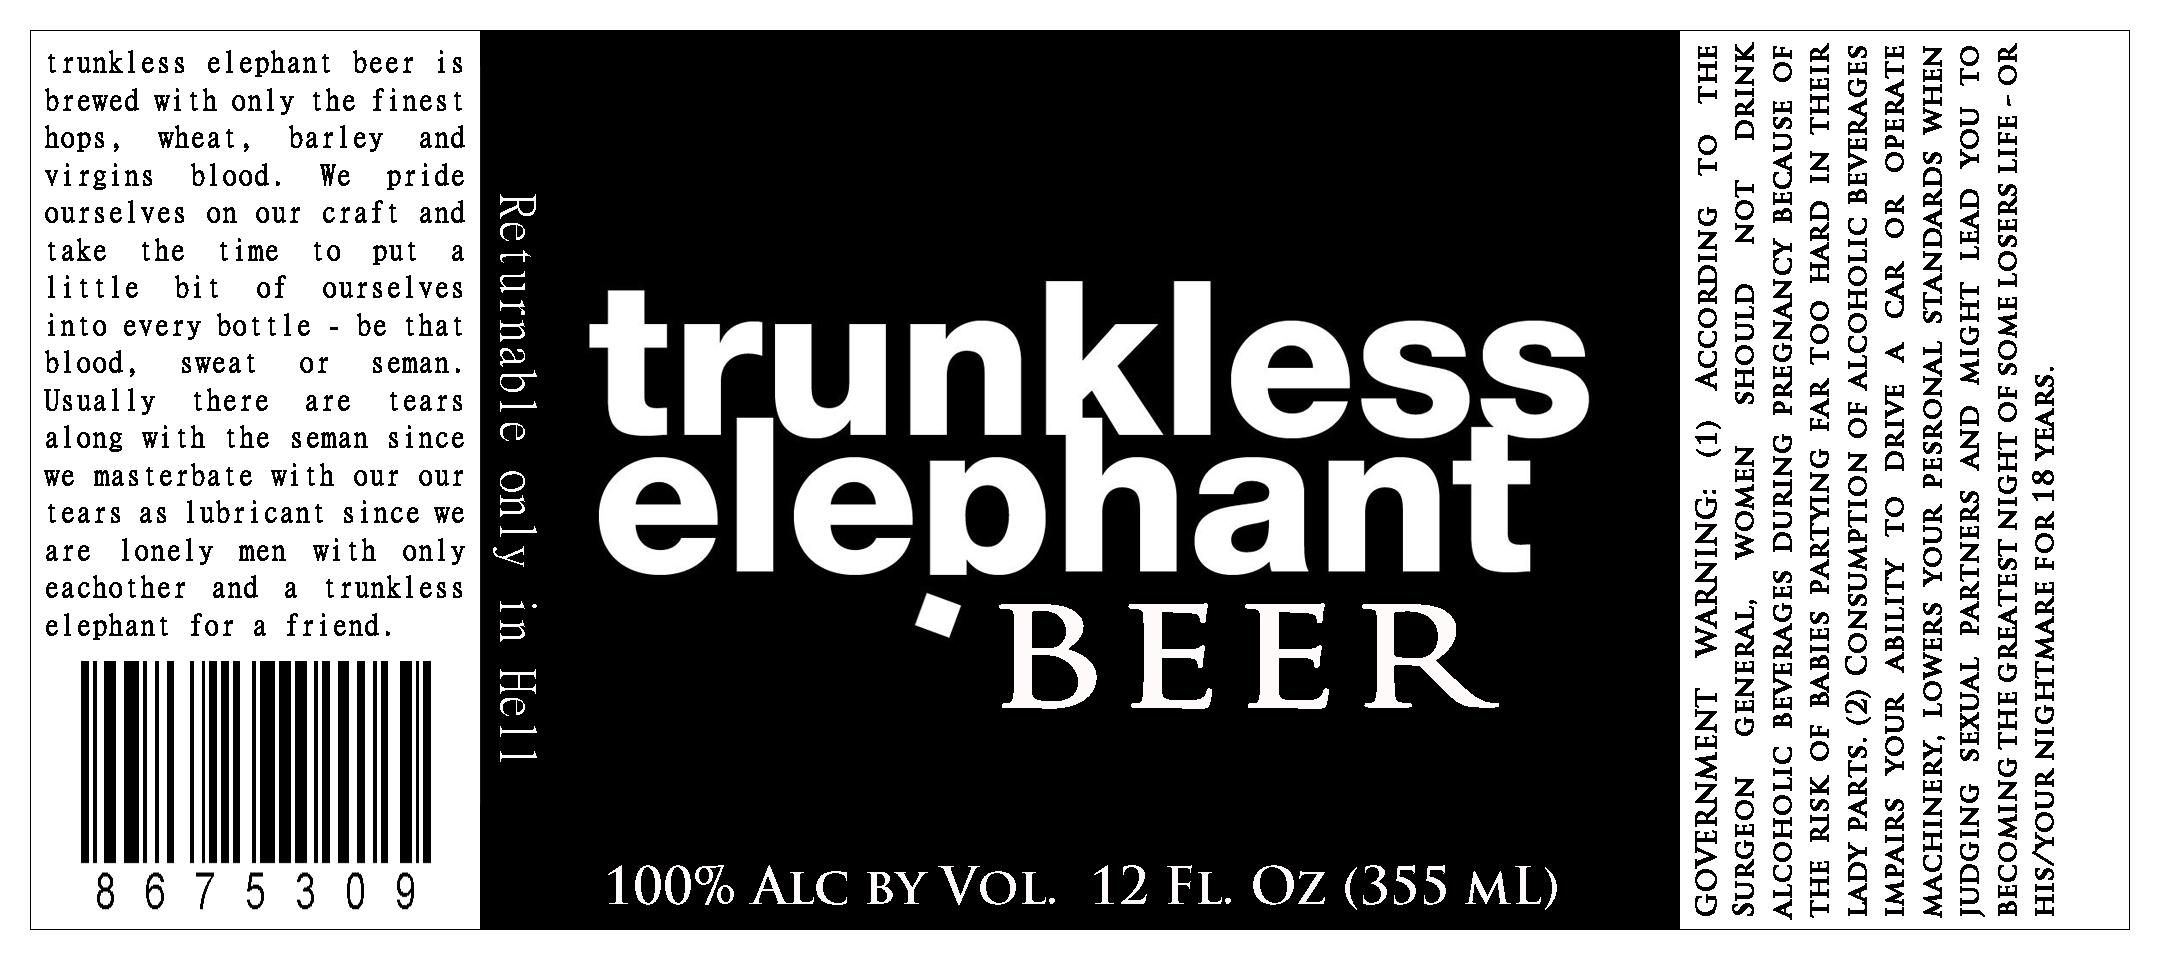 Trunkless Elephant label - film prop